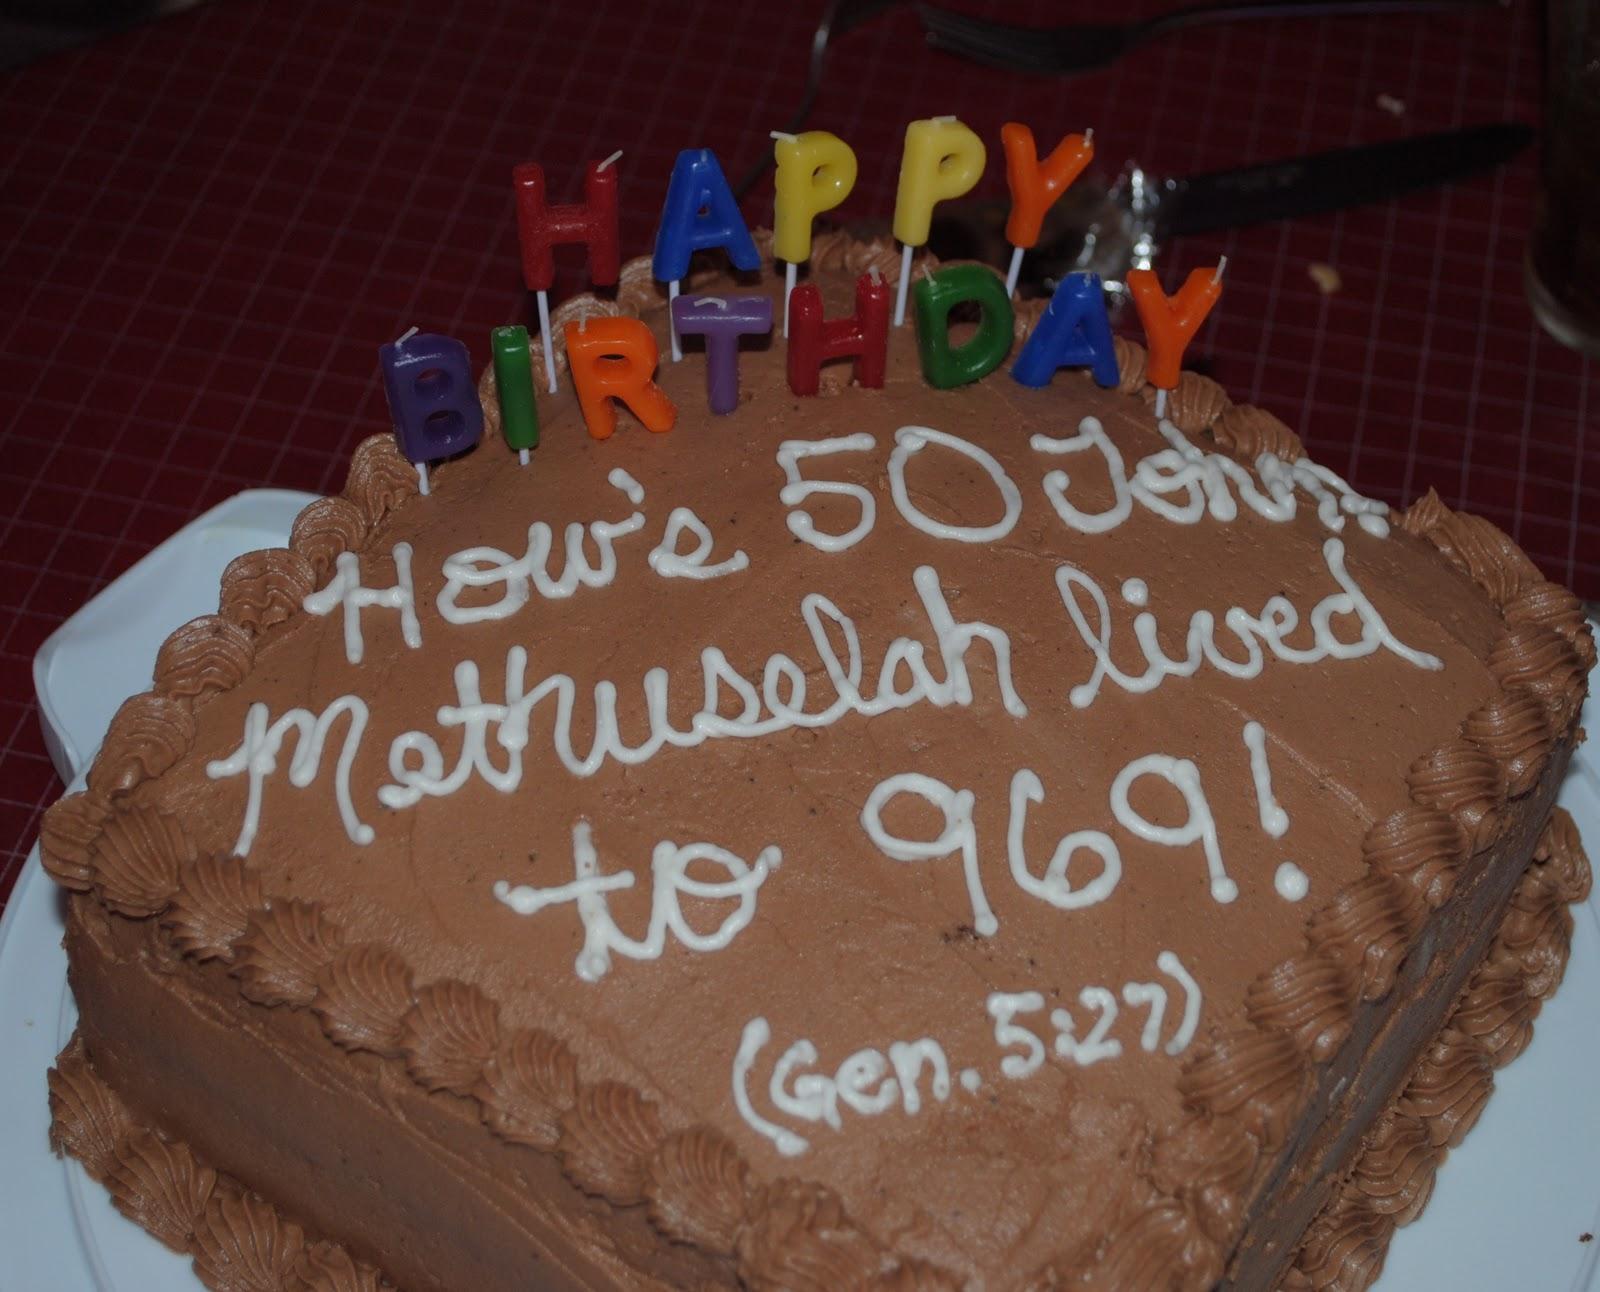 The Kroh s Nest 50th birthday cake